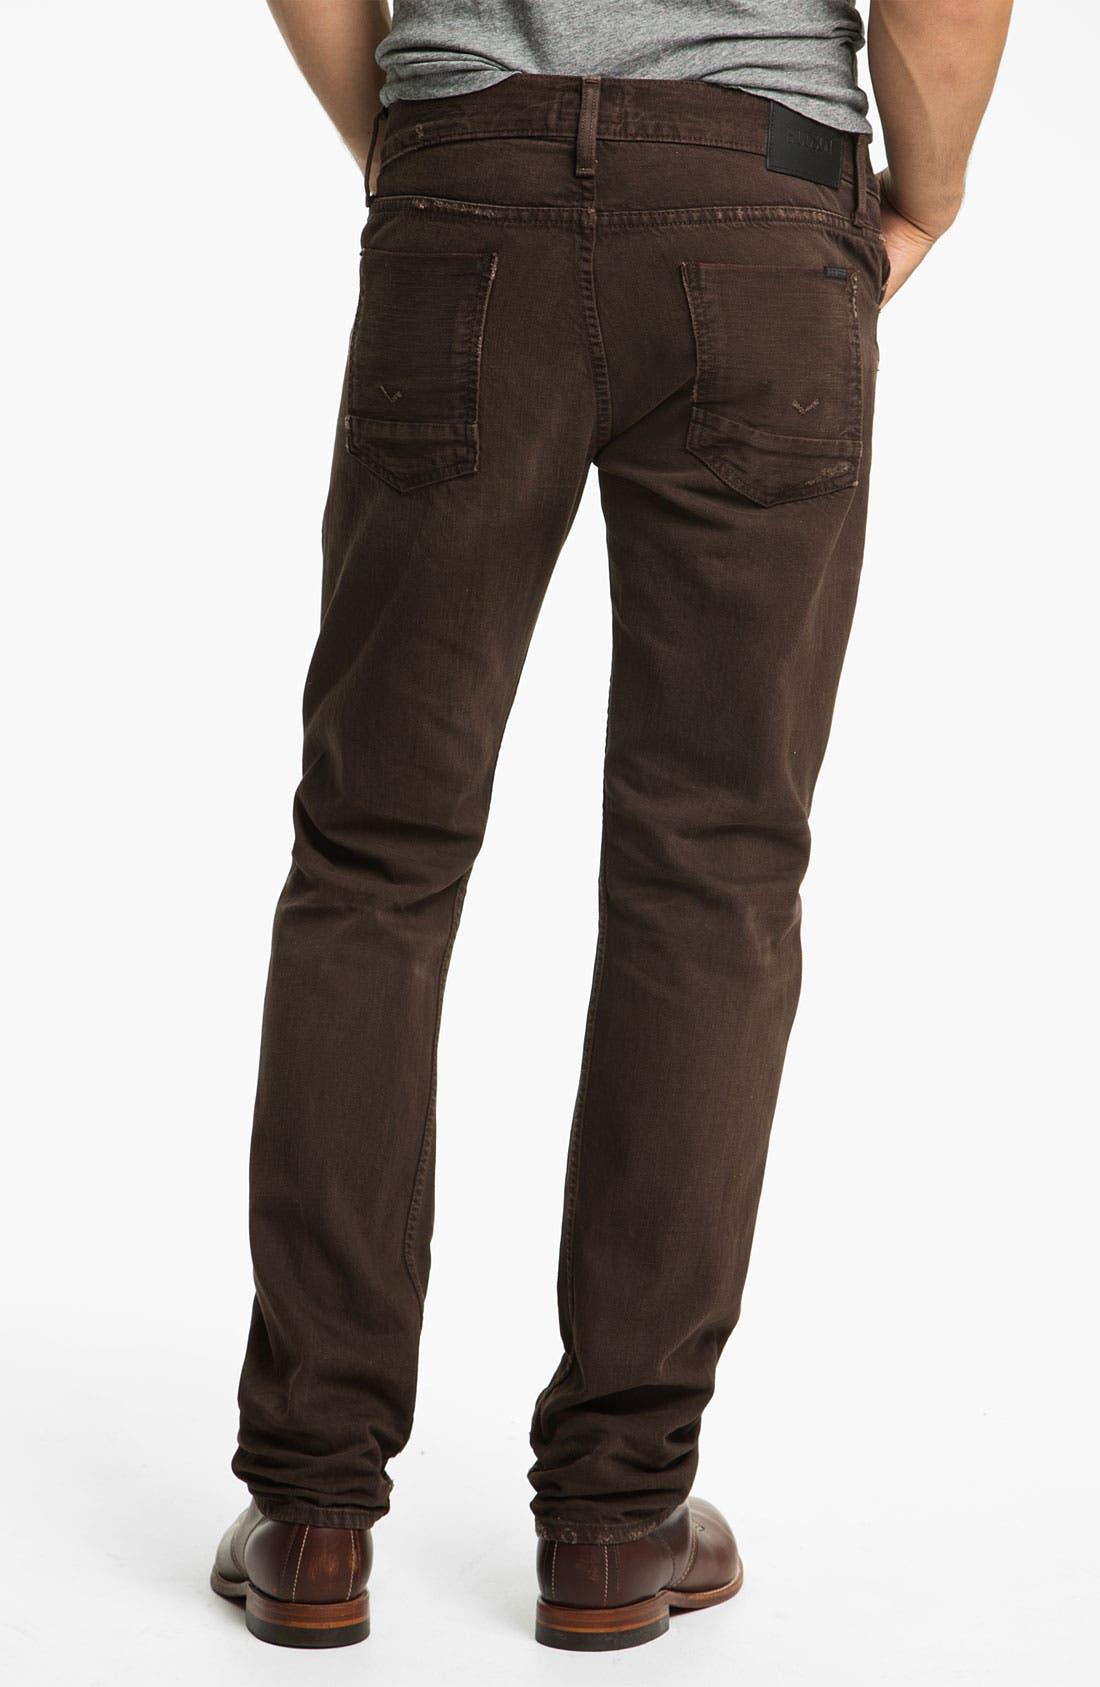 Alternate Image 1 Selected - Hudson Jeans 'Byron' Selvedge Jeans (Russet)